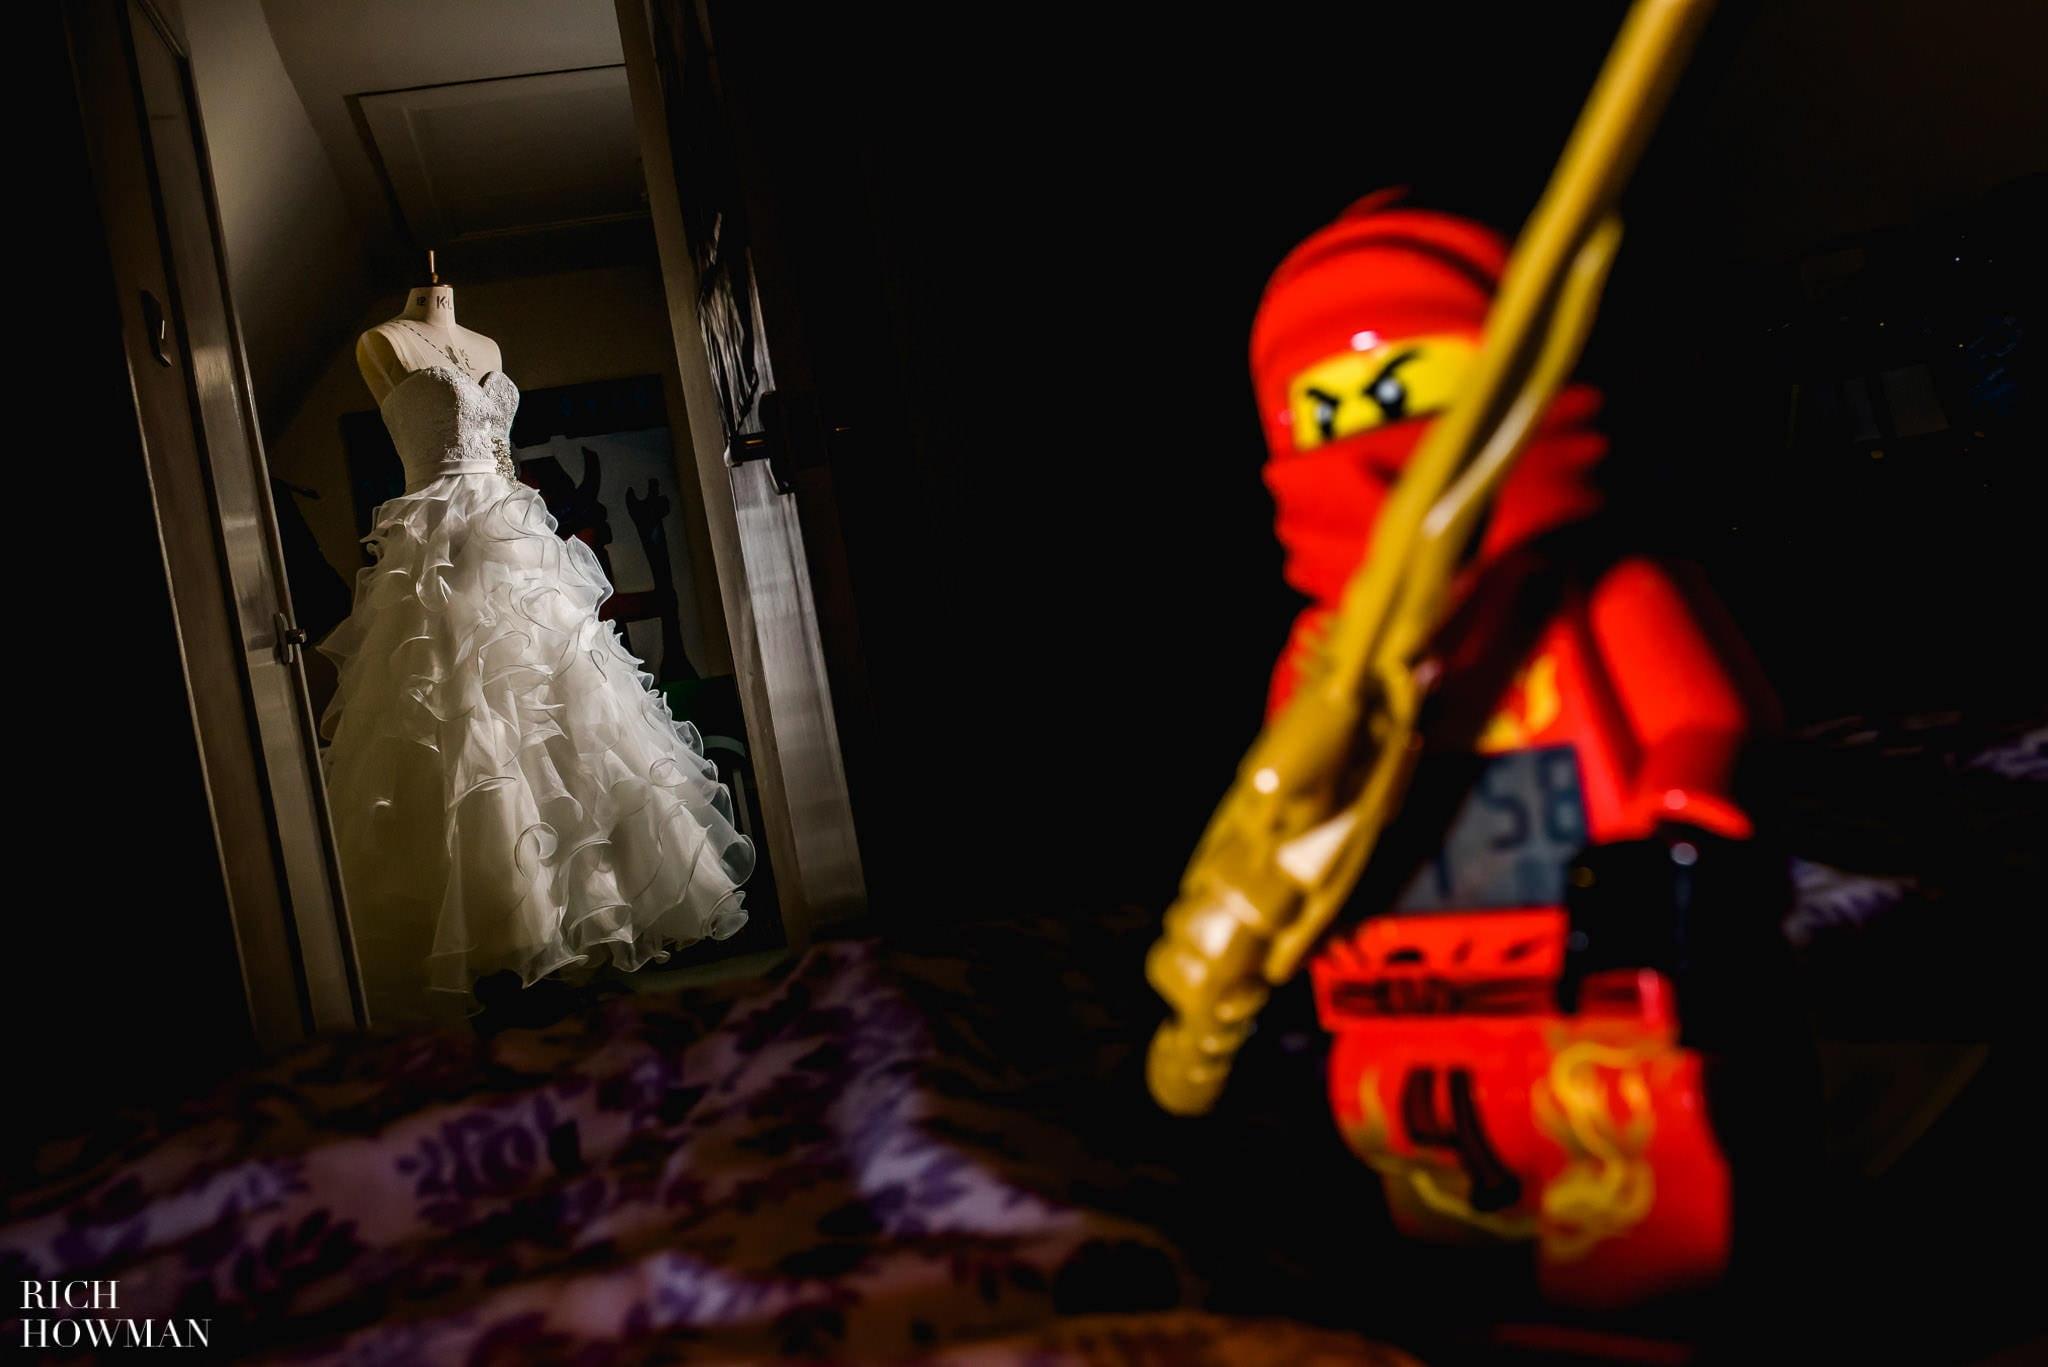 A Lego Ninja guarding the wedding dress